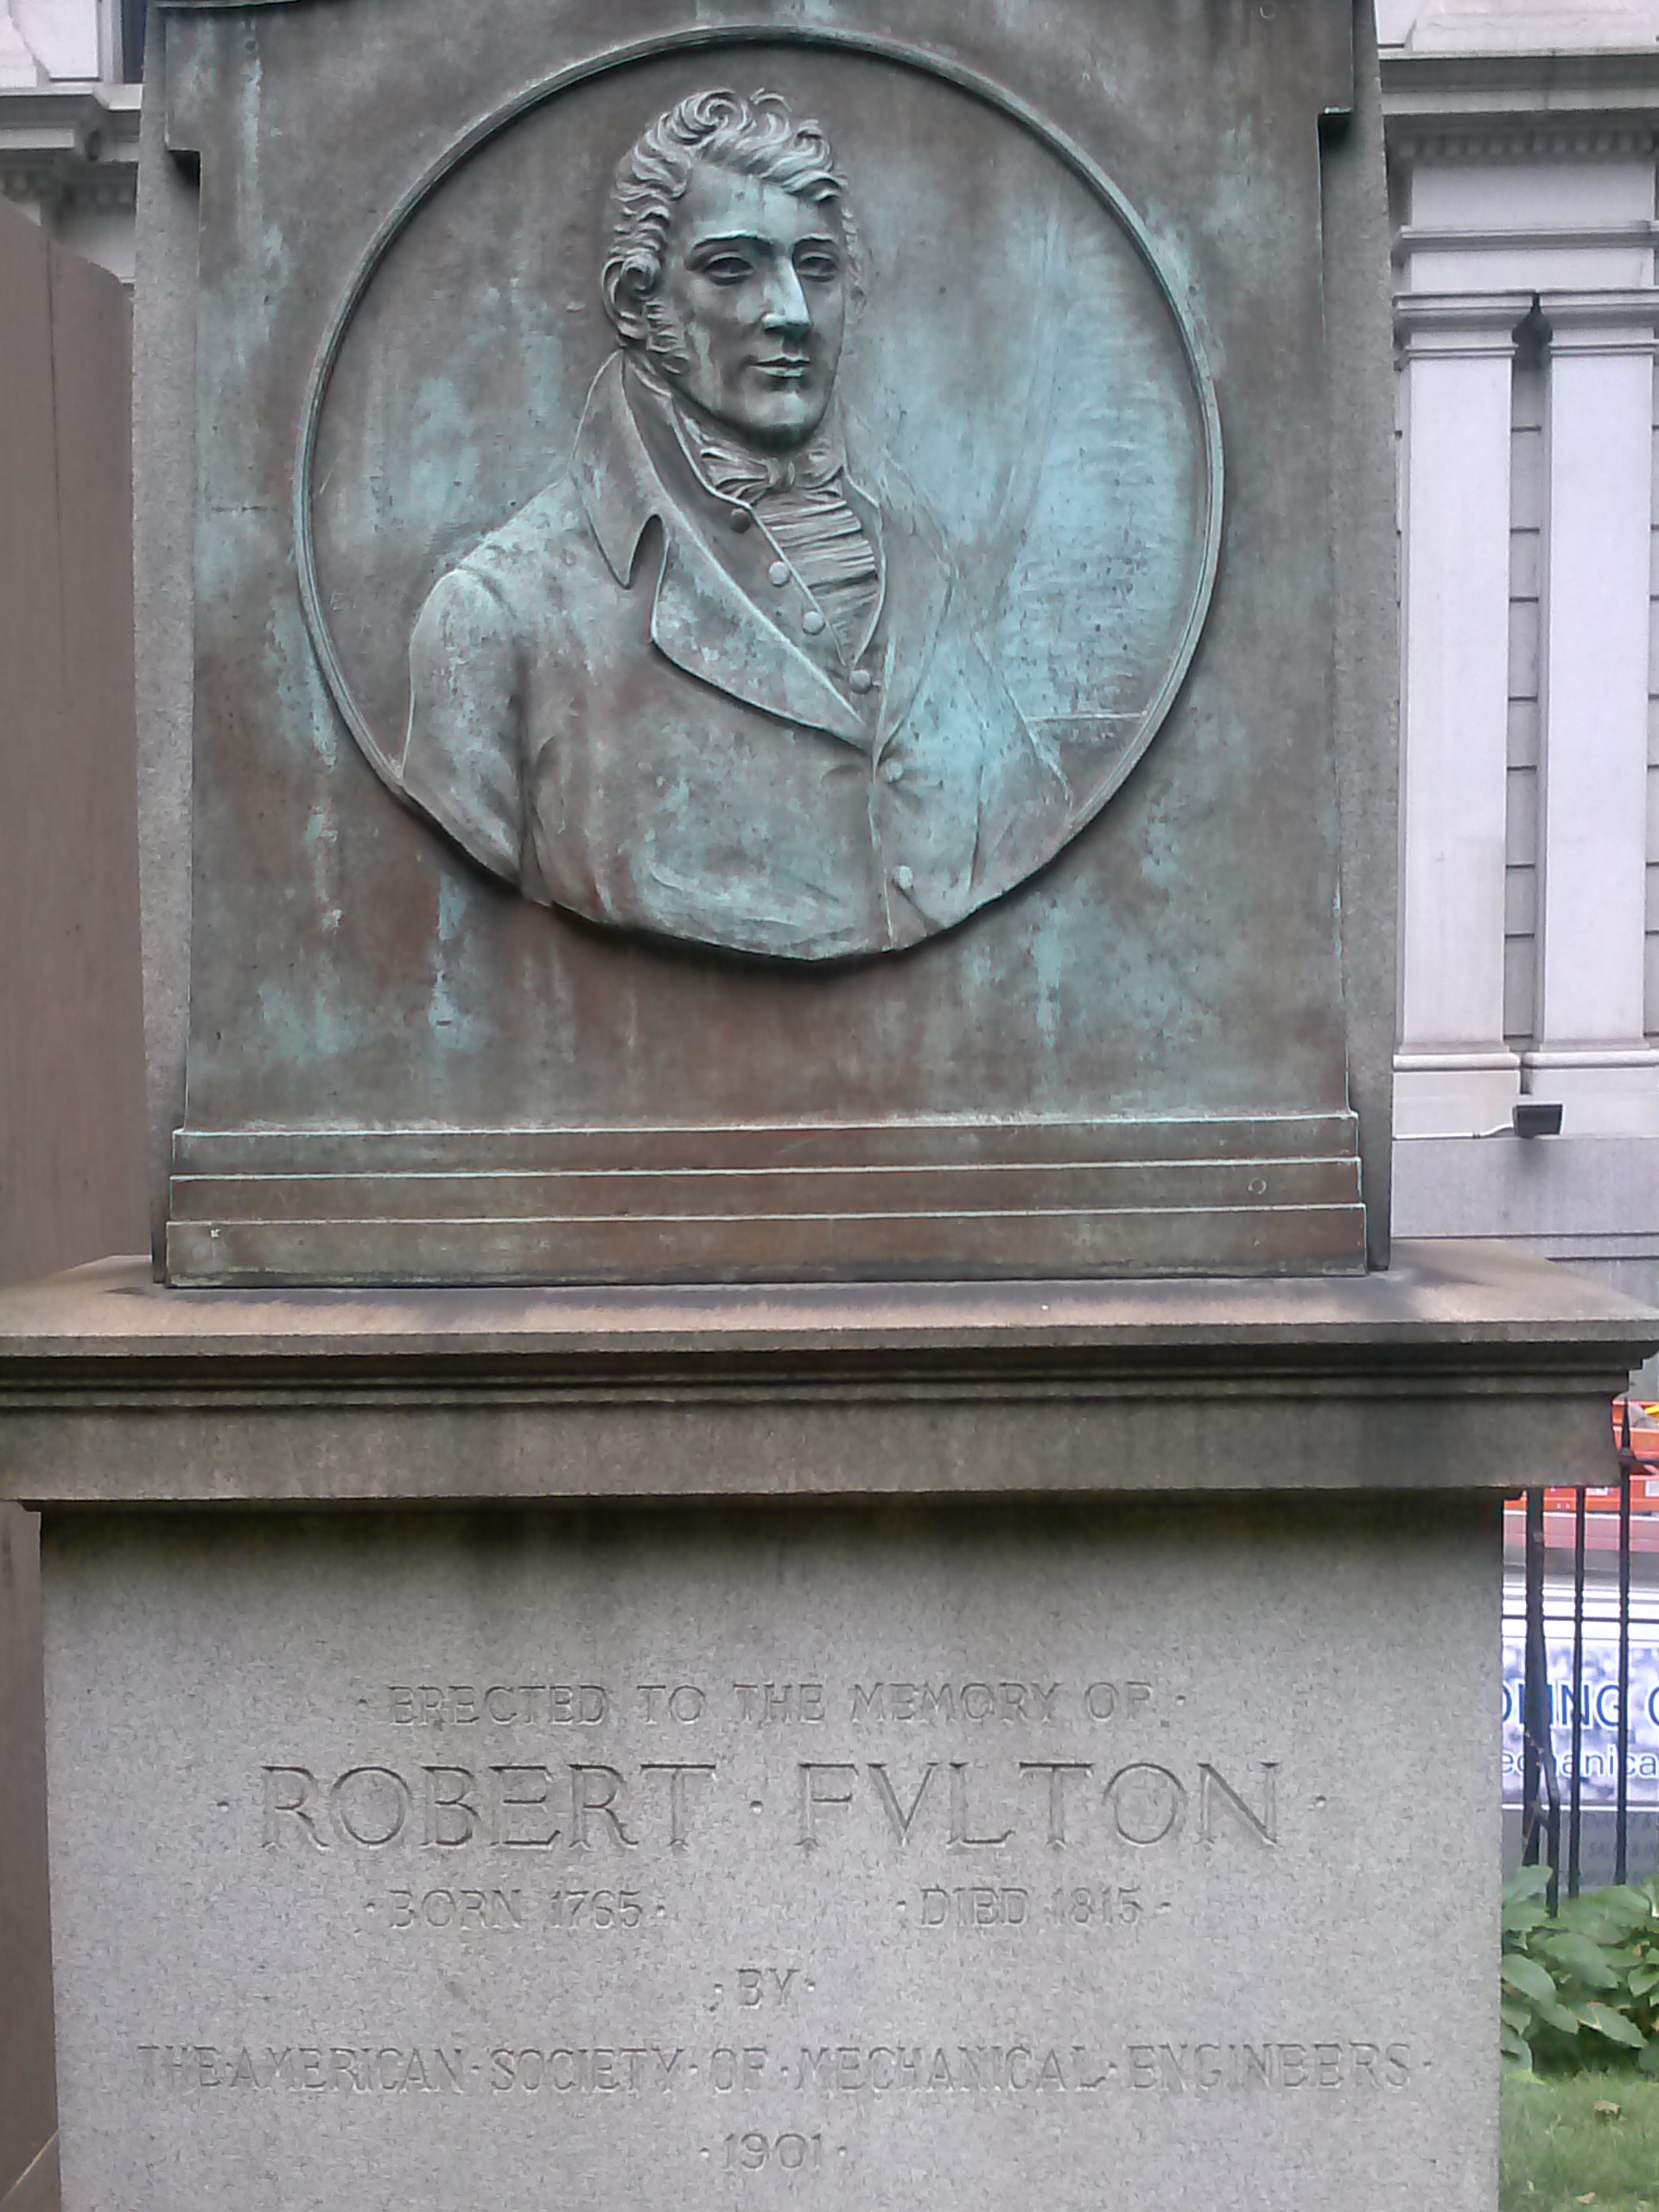 Robert Fulton's tombstone